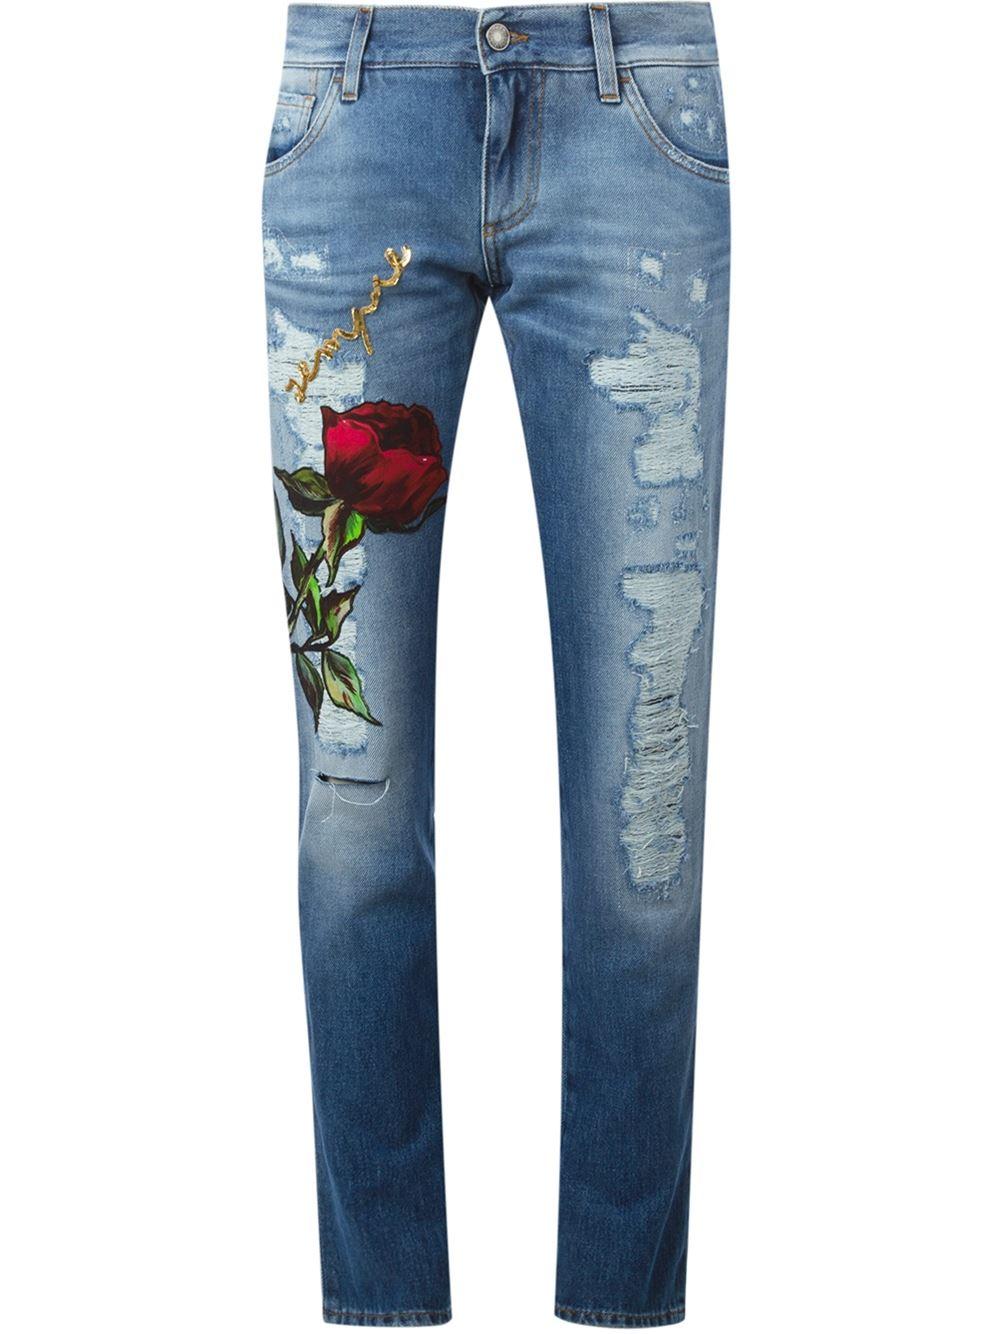 Jeans Dolceamp; Blue Boyfriend Gabbana Rose Patch dhQrst